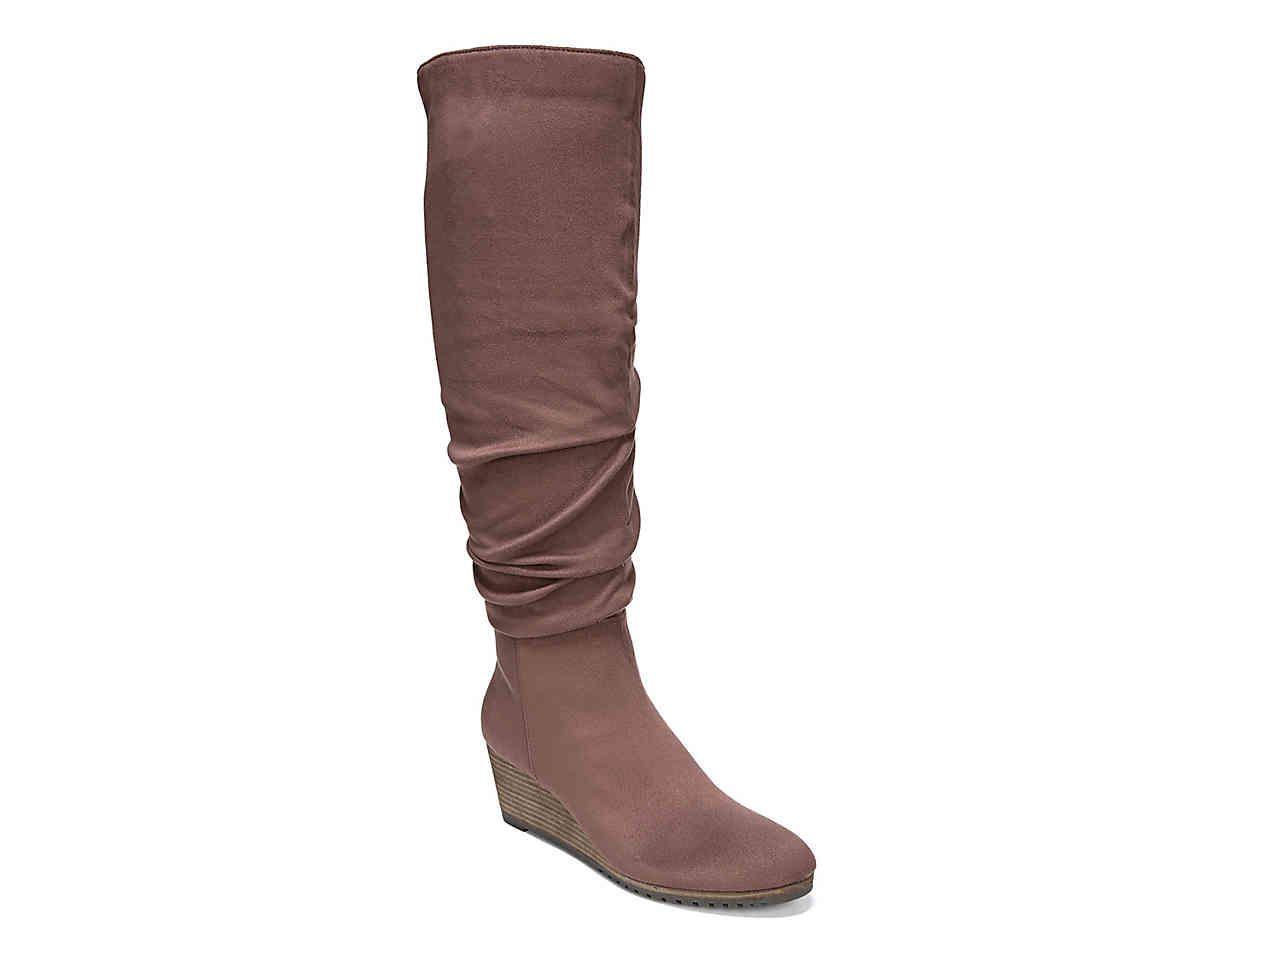 Winter Womens Warm Snow Thicken Boots Fur Trim Knee High Boots Hidden Wedge Heel